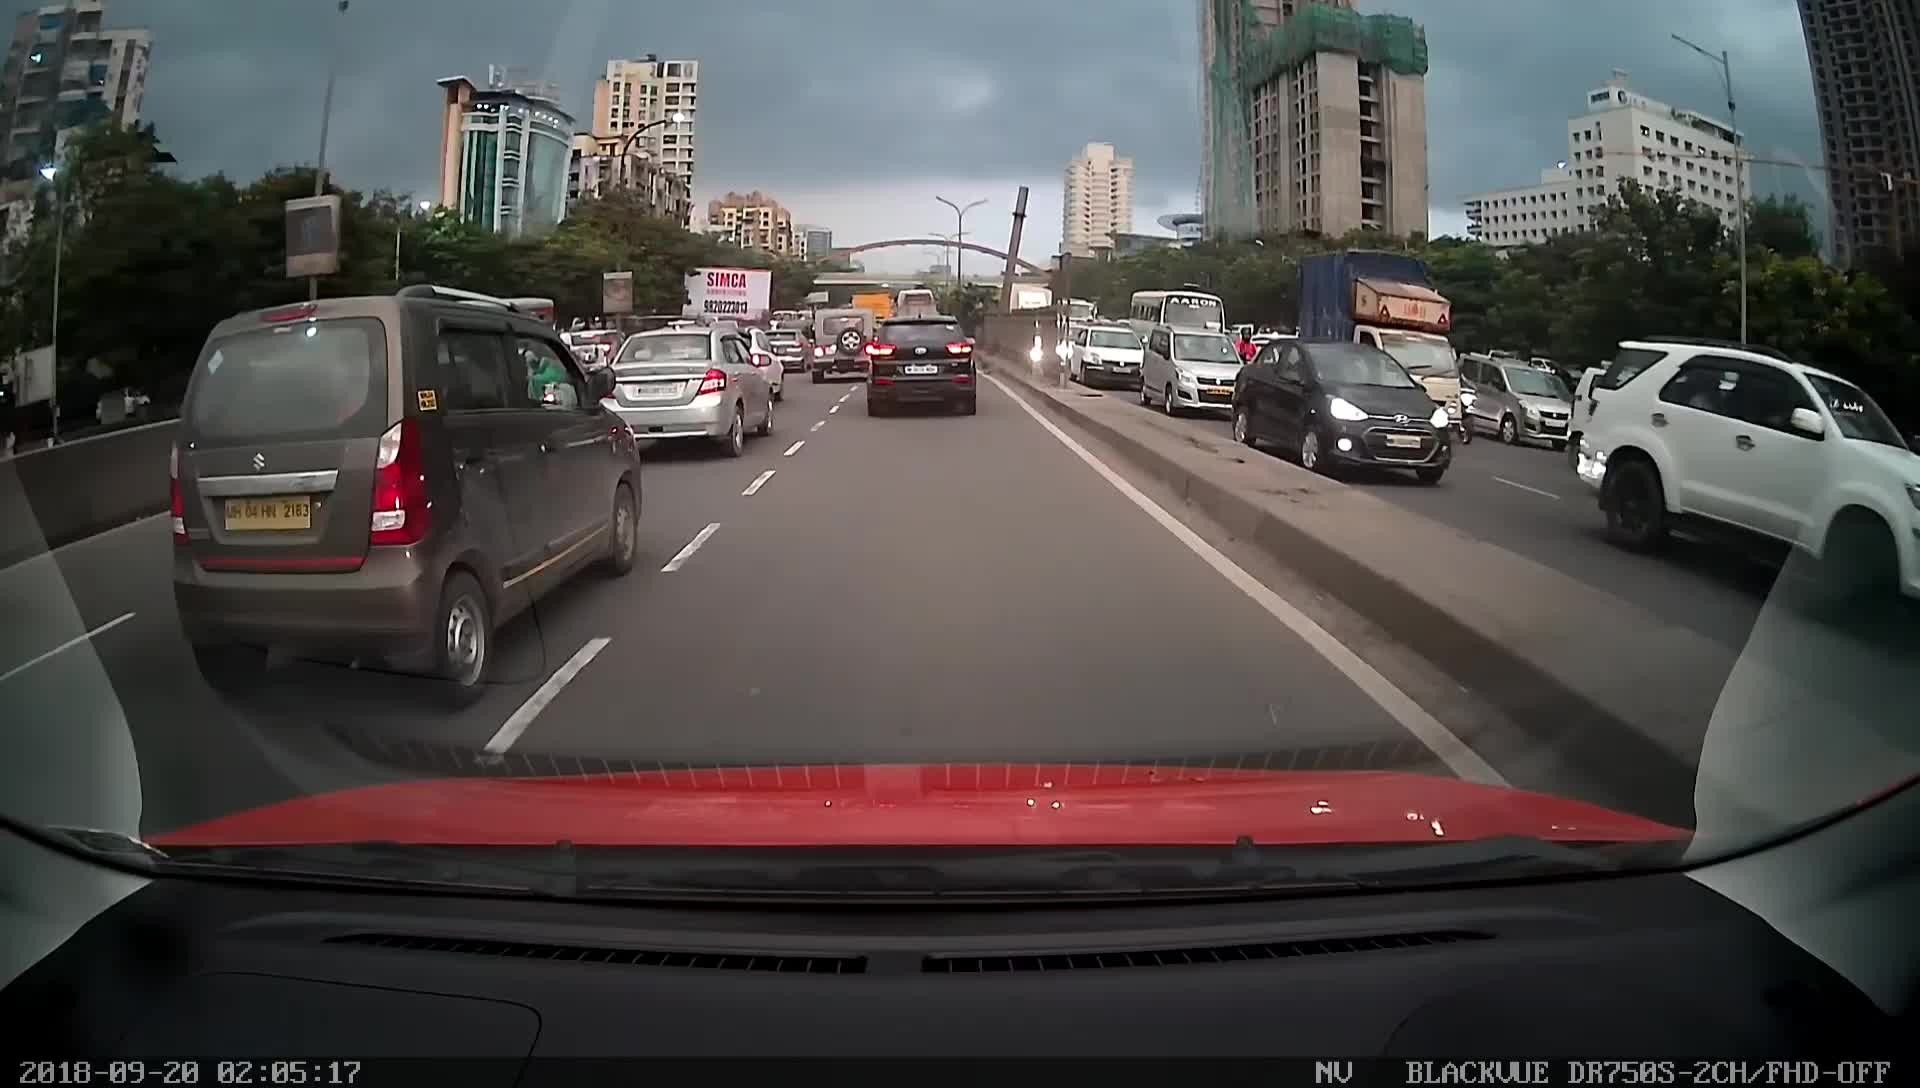 Dashcam Day 1 - Incident 2 GIFs